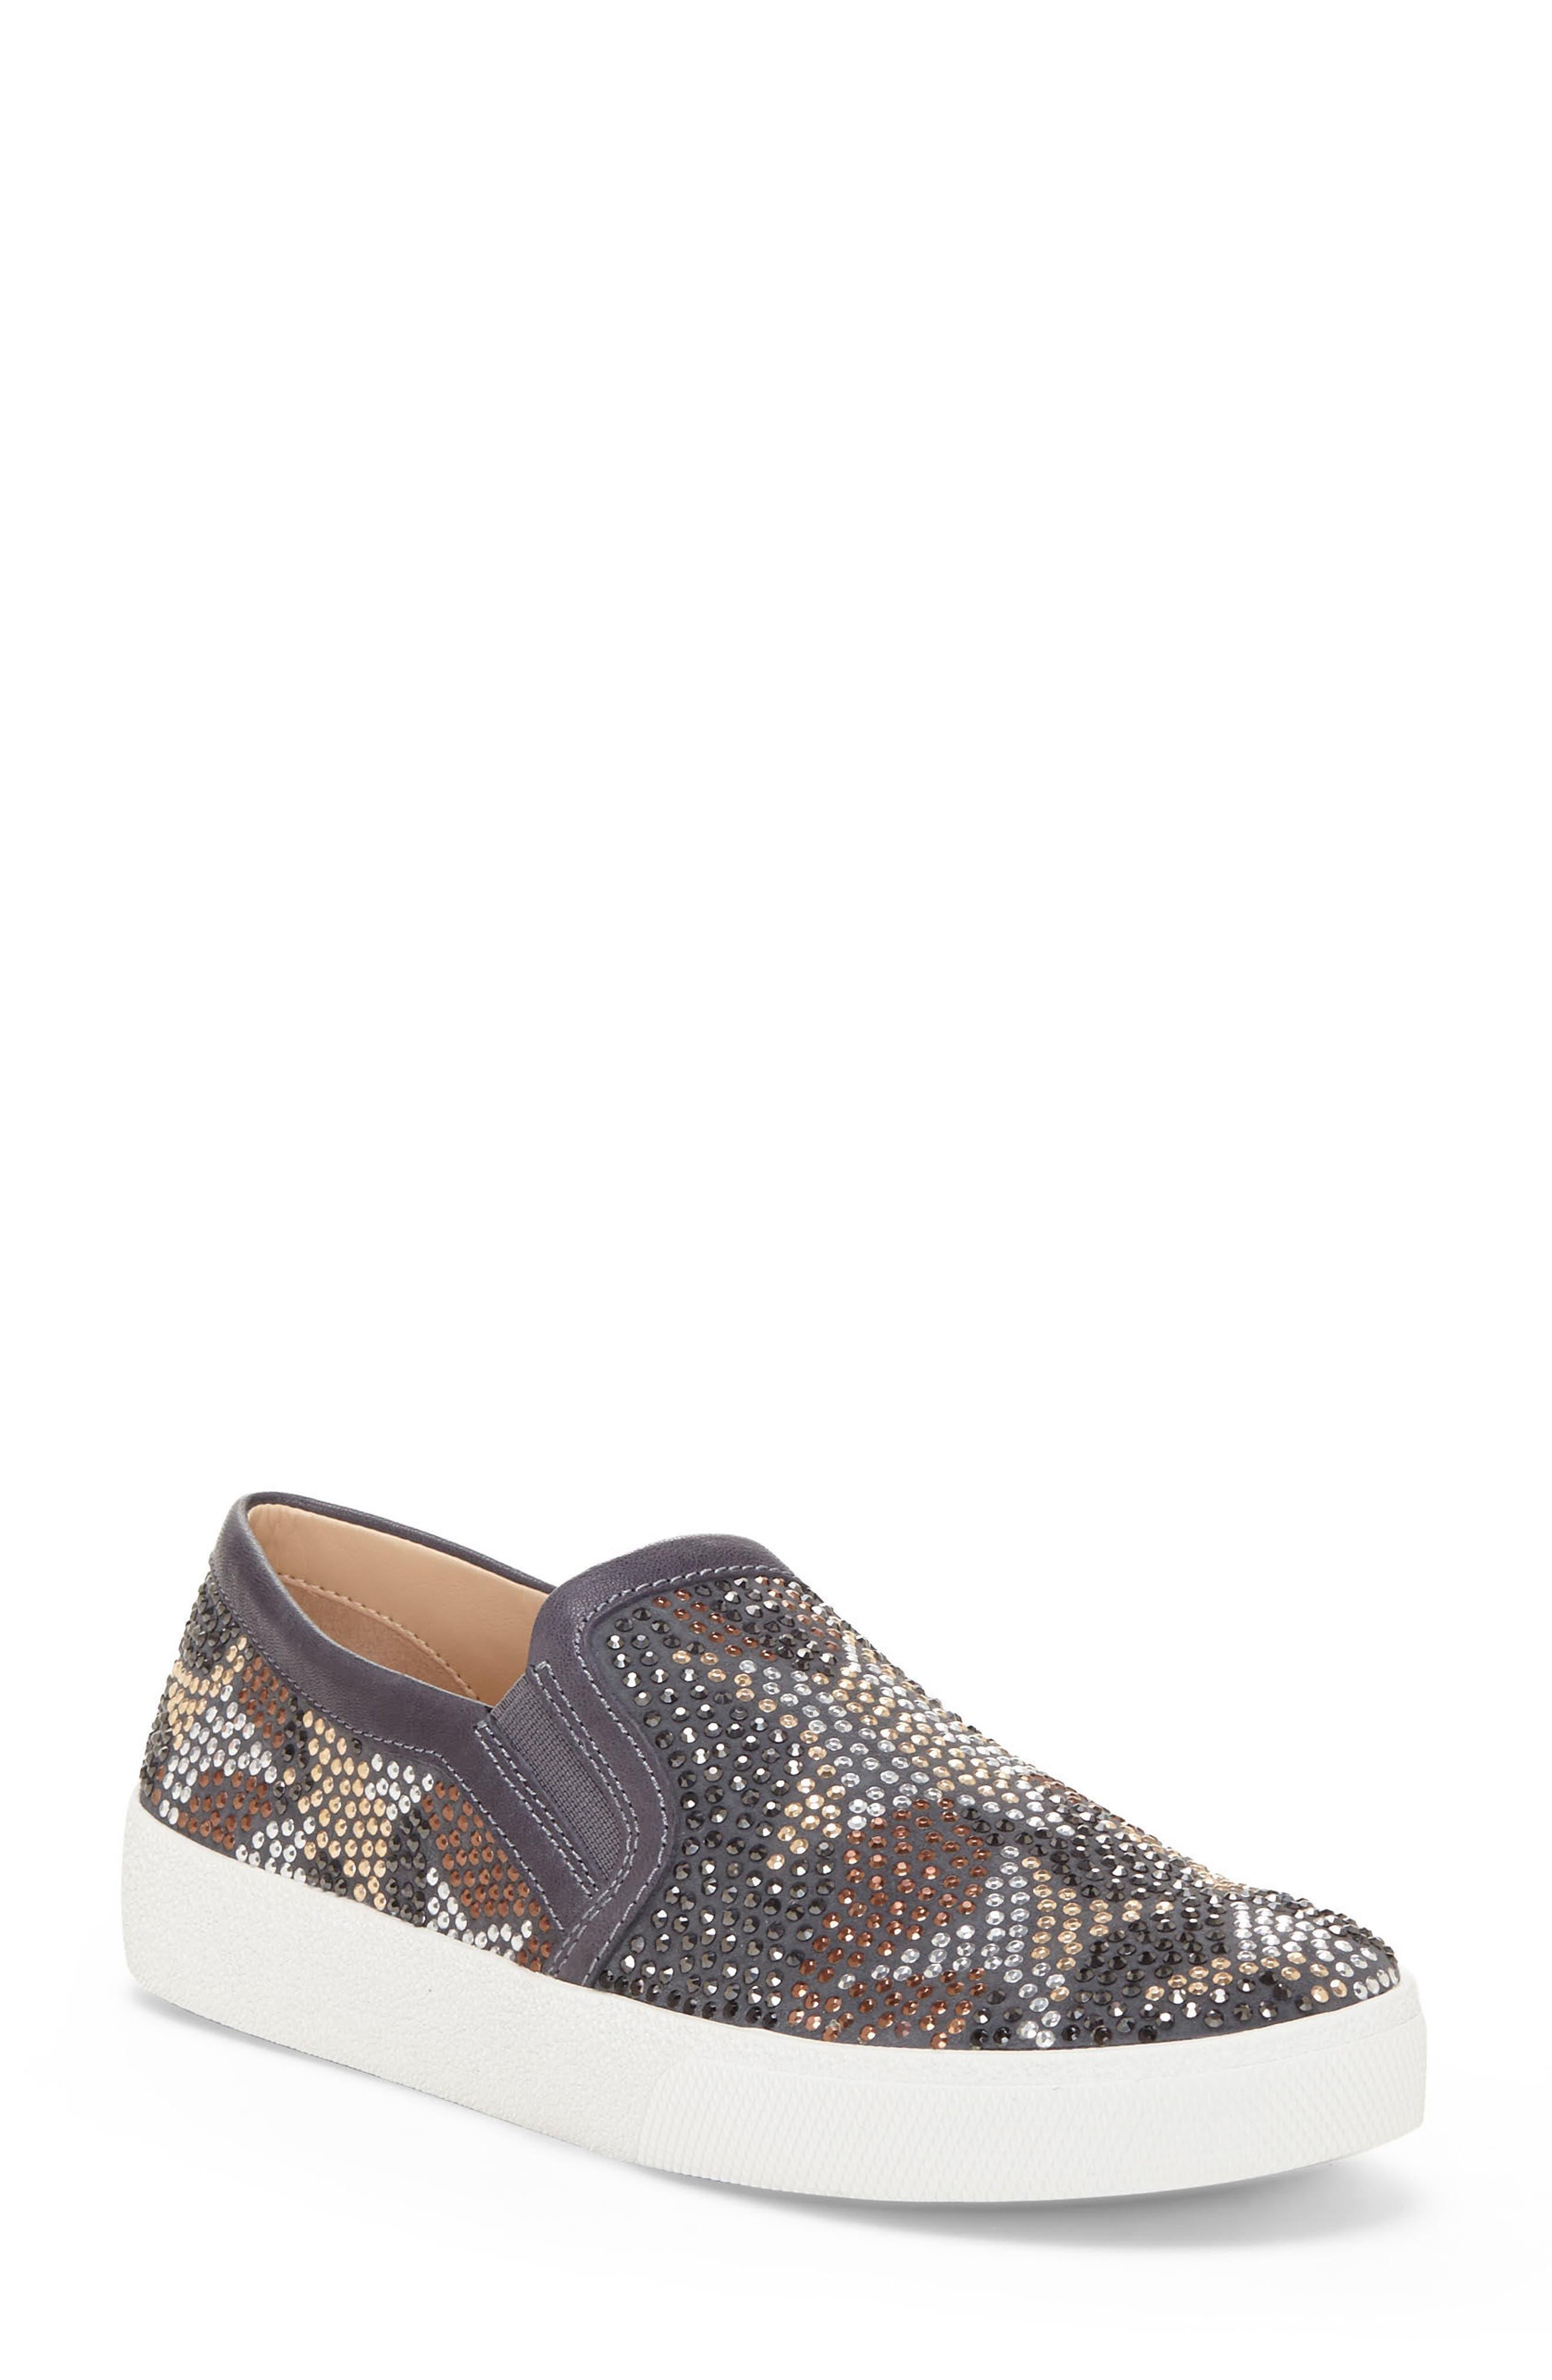 Canita Slip-On Sneaker,                             Main thumbnail 2, color,